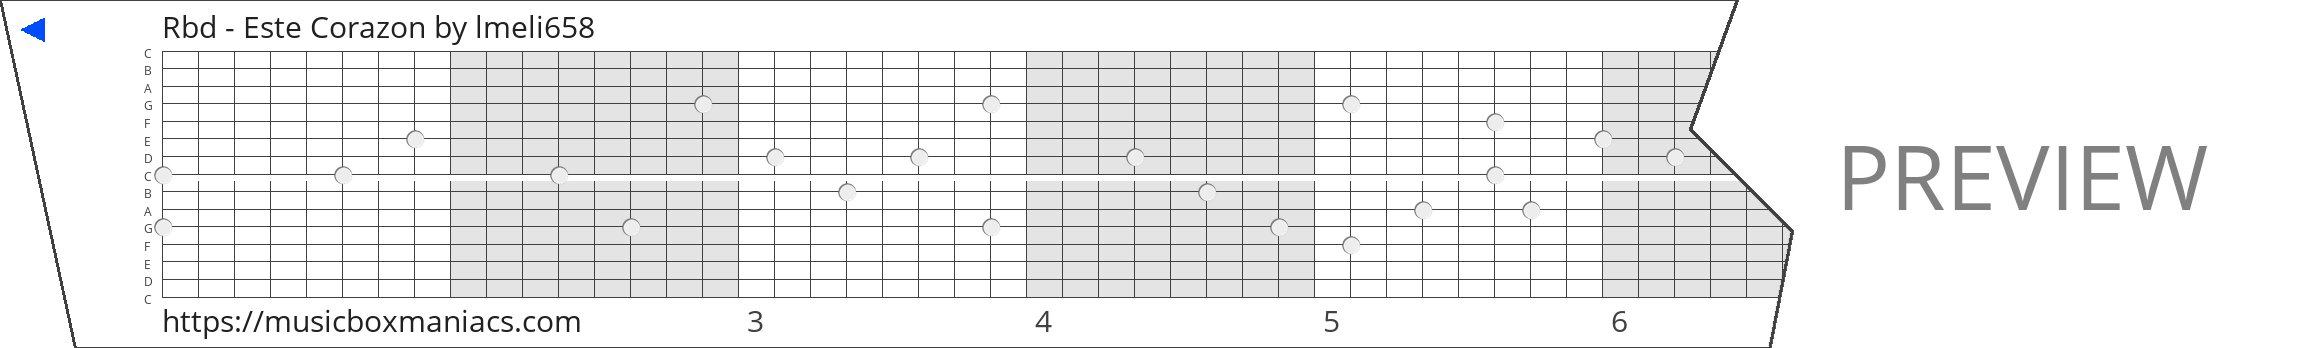 Rbd - Este Corazon 15 note music box paper strip